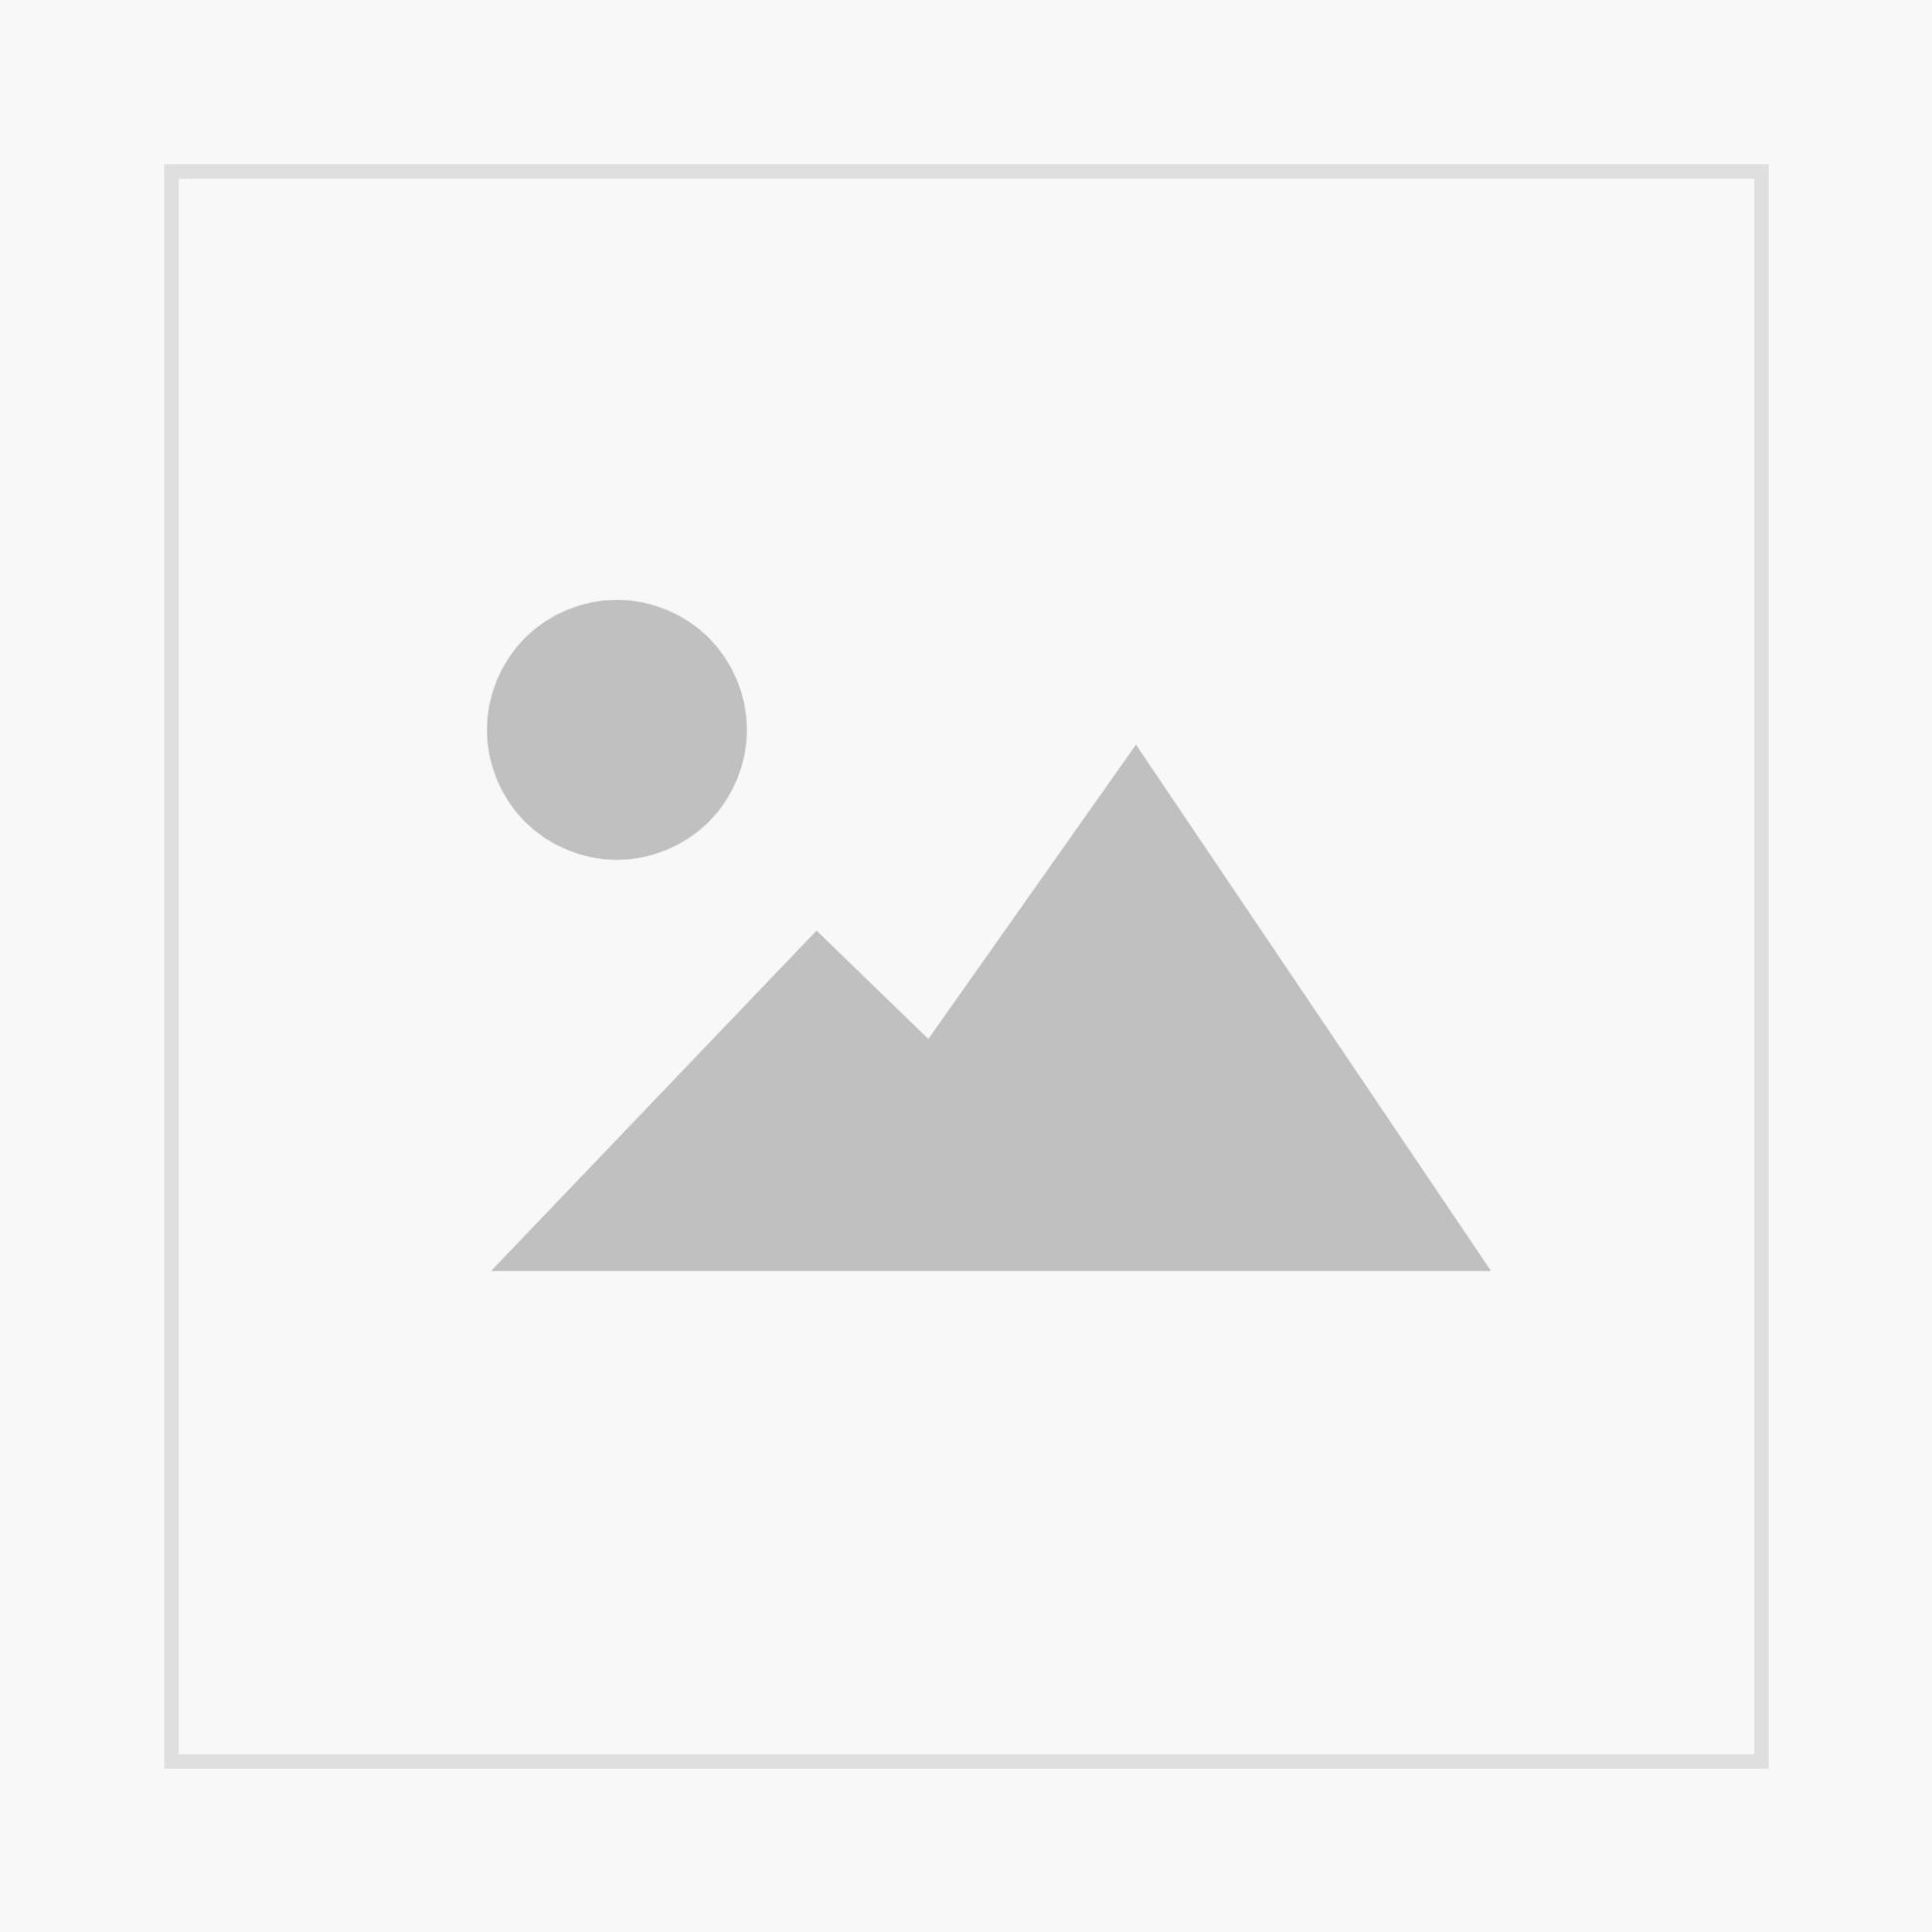 profi Landtechnik Kalender 2019